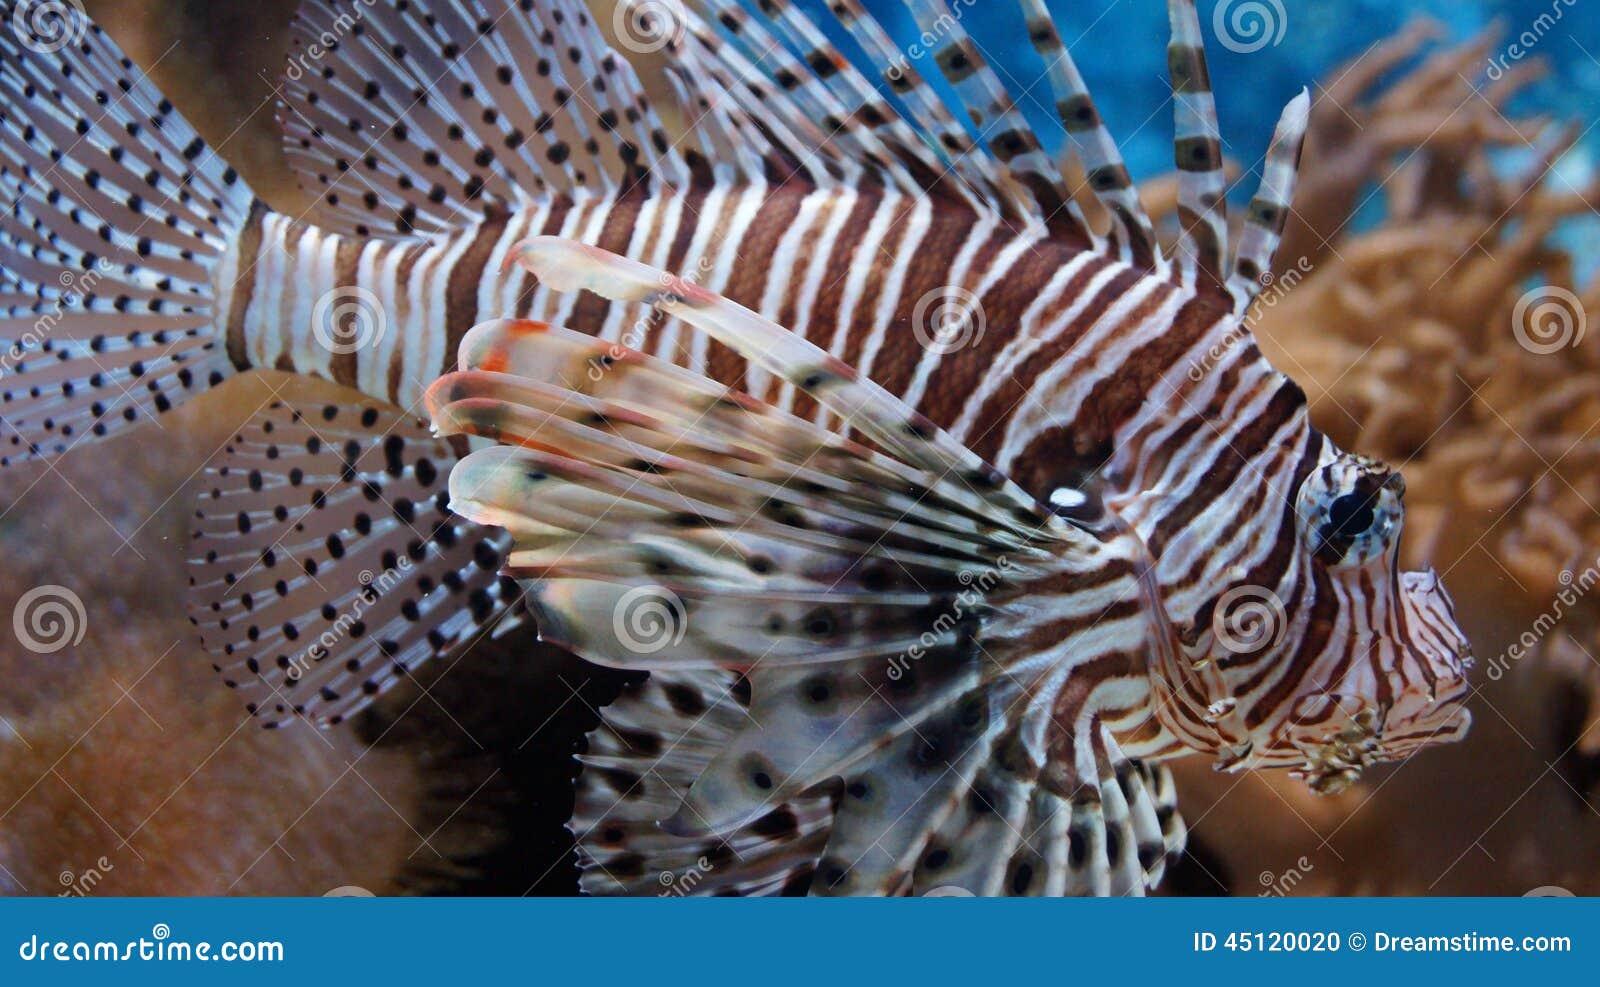 Tropical Fish Zebra - Lionfish. Striped Spines. Poisonous. Lives ...